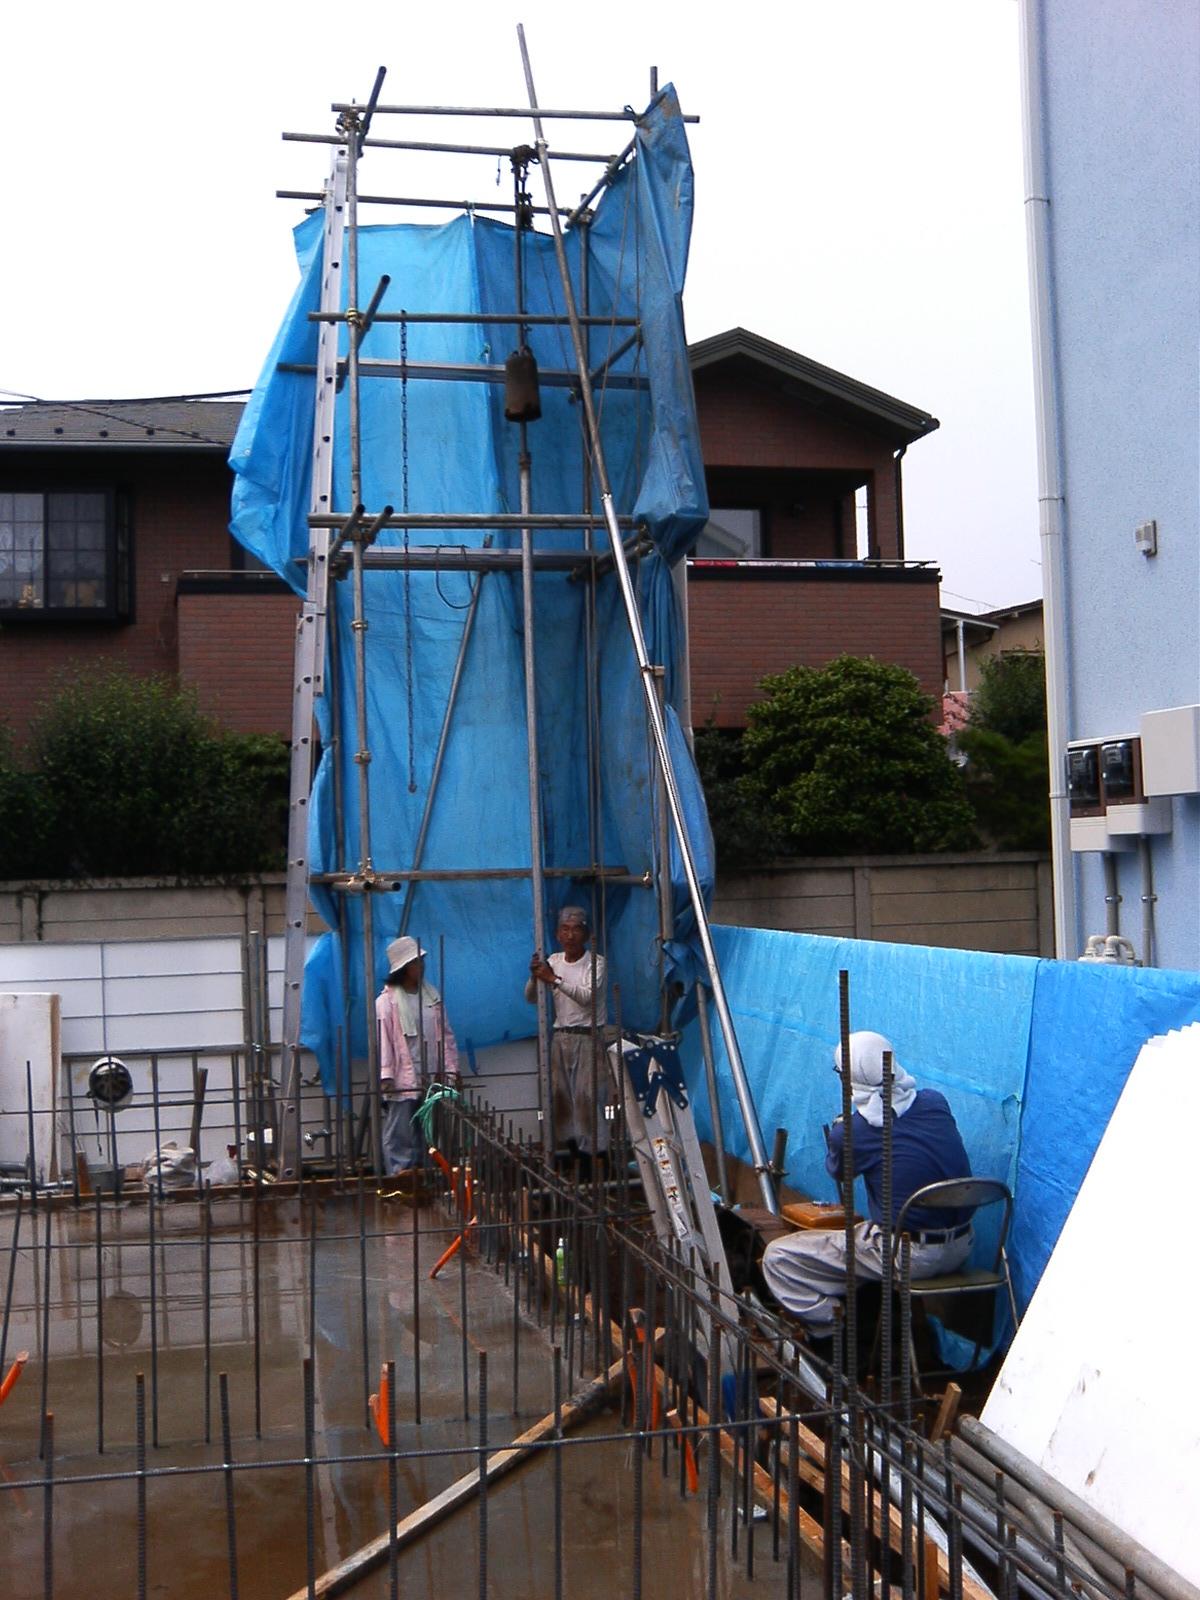 vol.2ローコスト外断熱に''井戸堀り''?